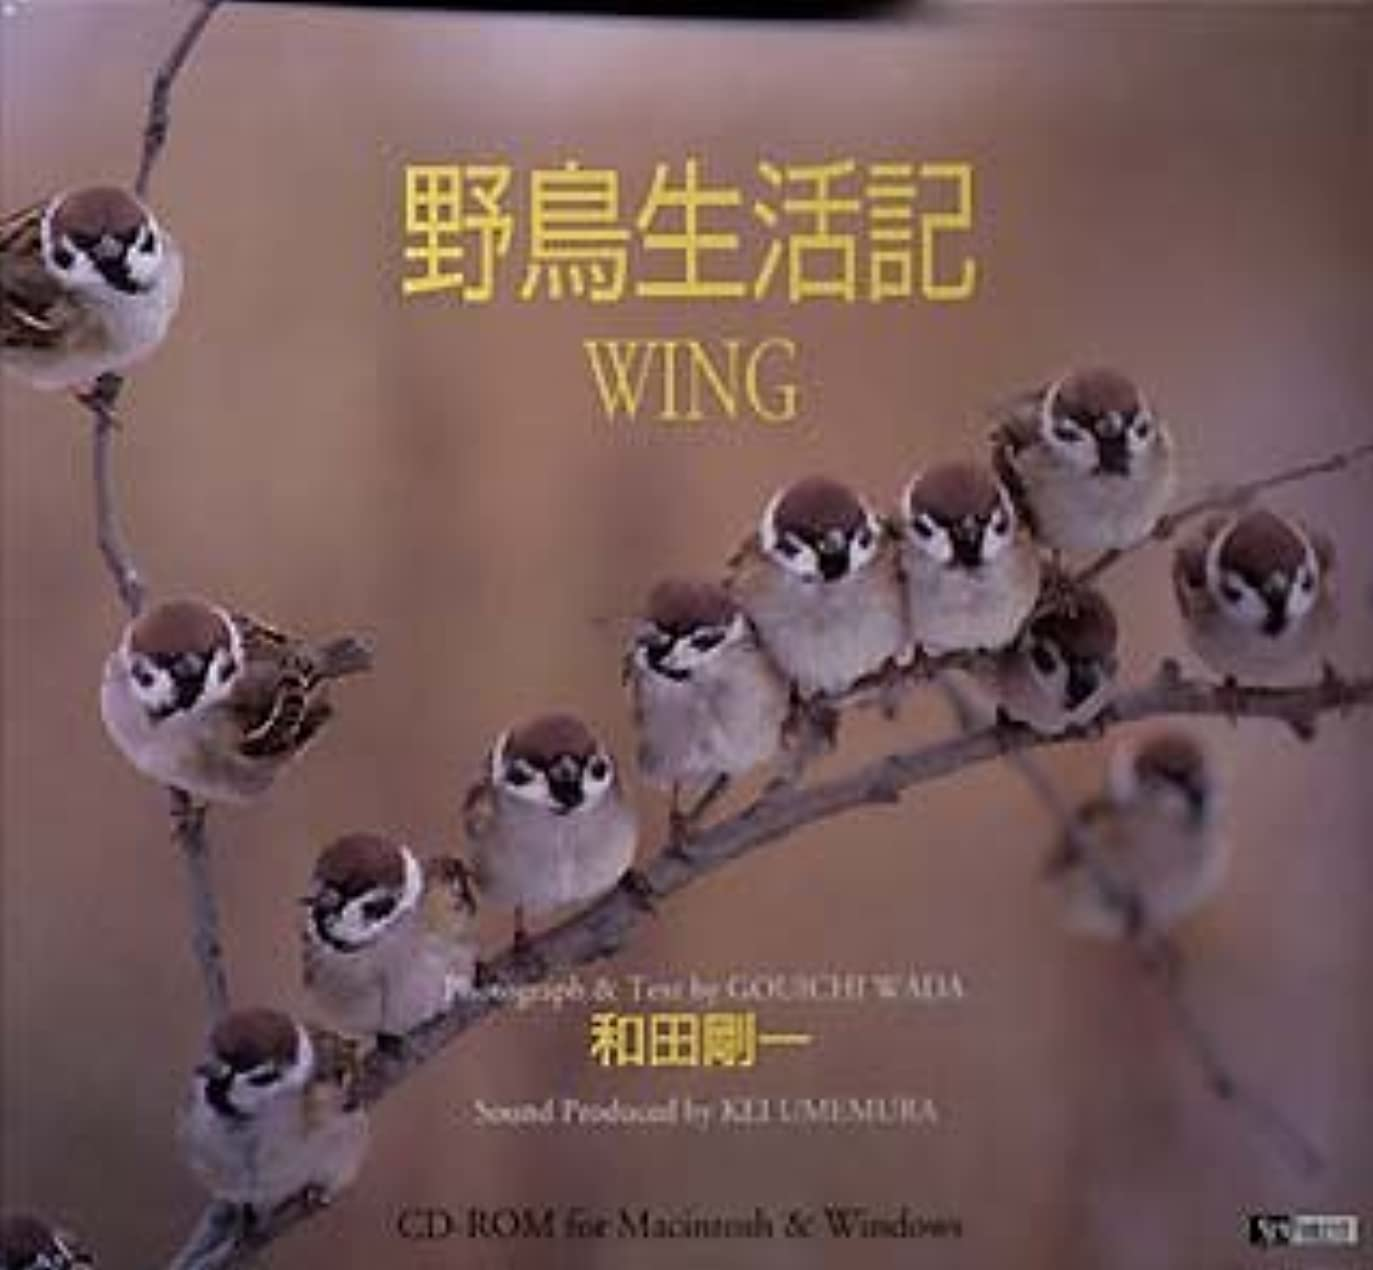 前奏曲公平な政権野鳥生活記 Wing